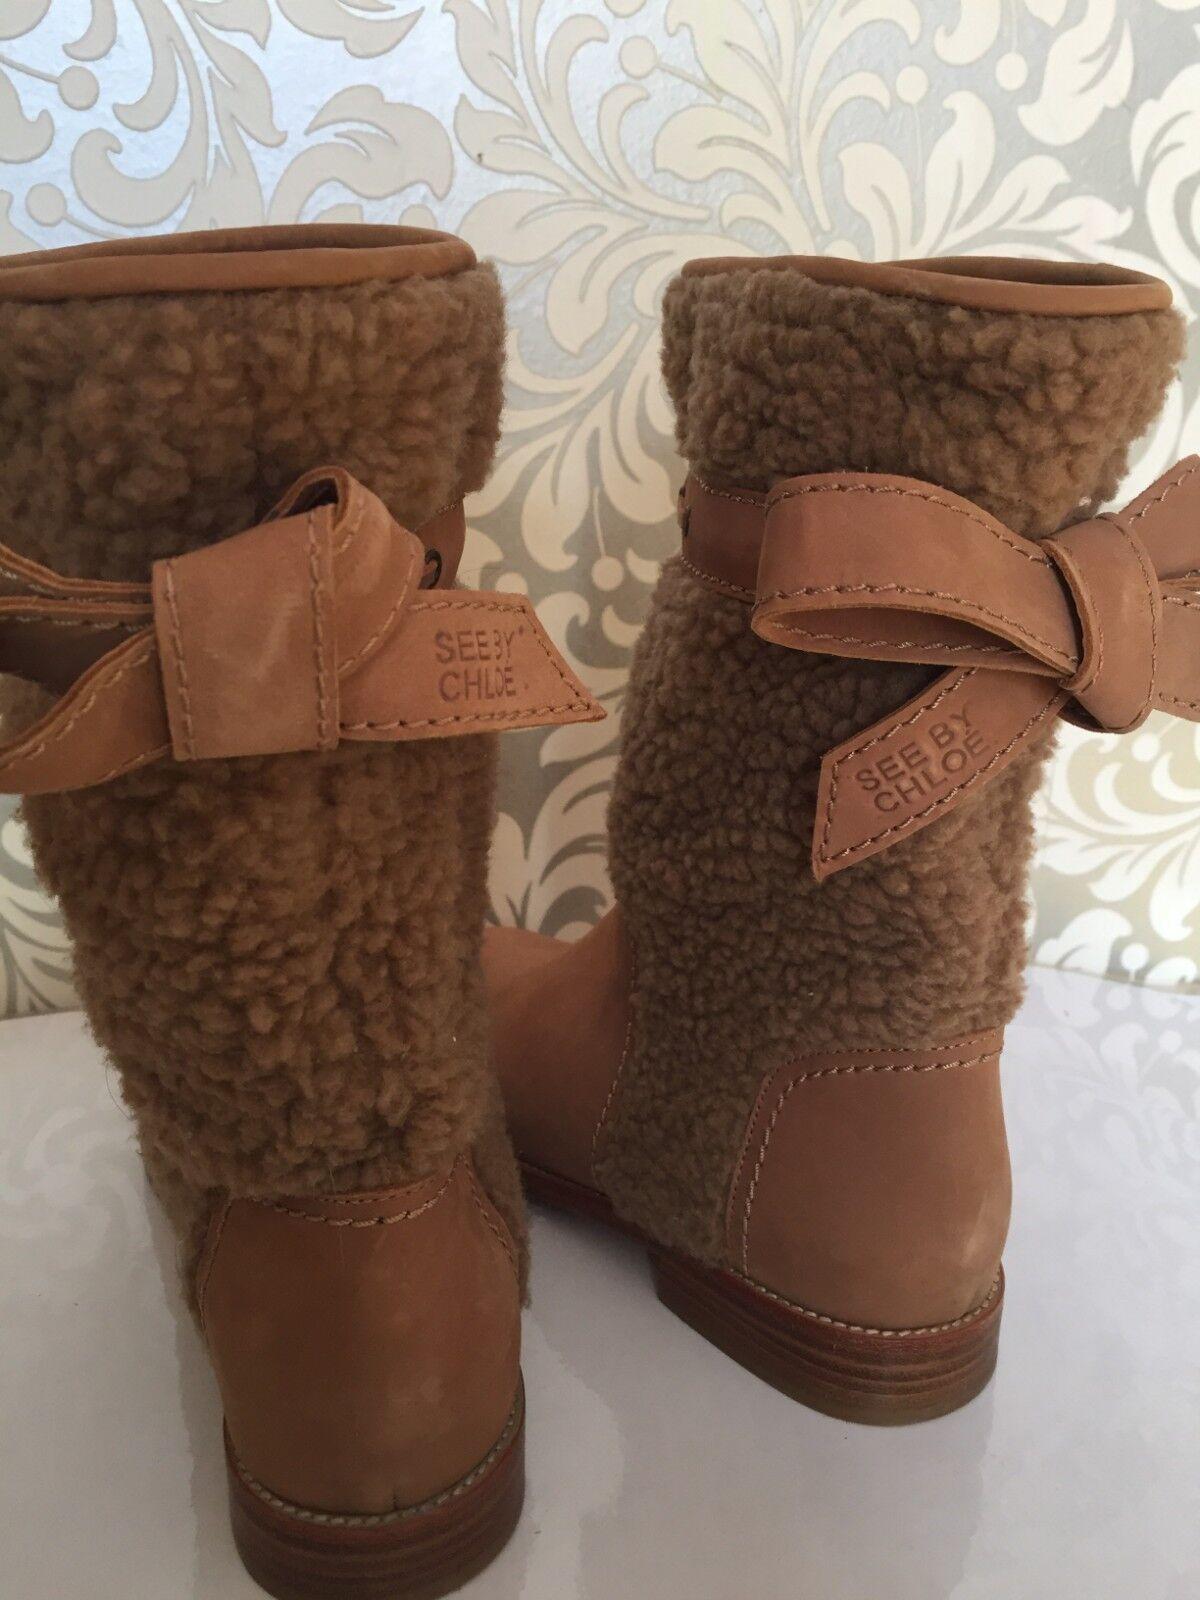 See by Chloé Echt Echt Echt Leder botas de cuero talla 36  salida de fábrica